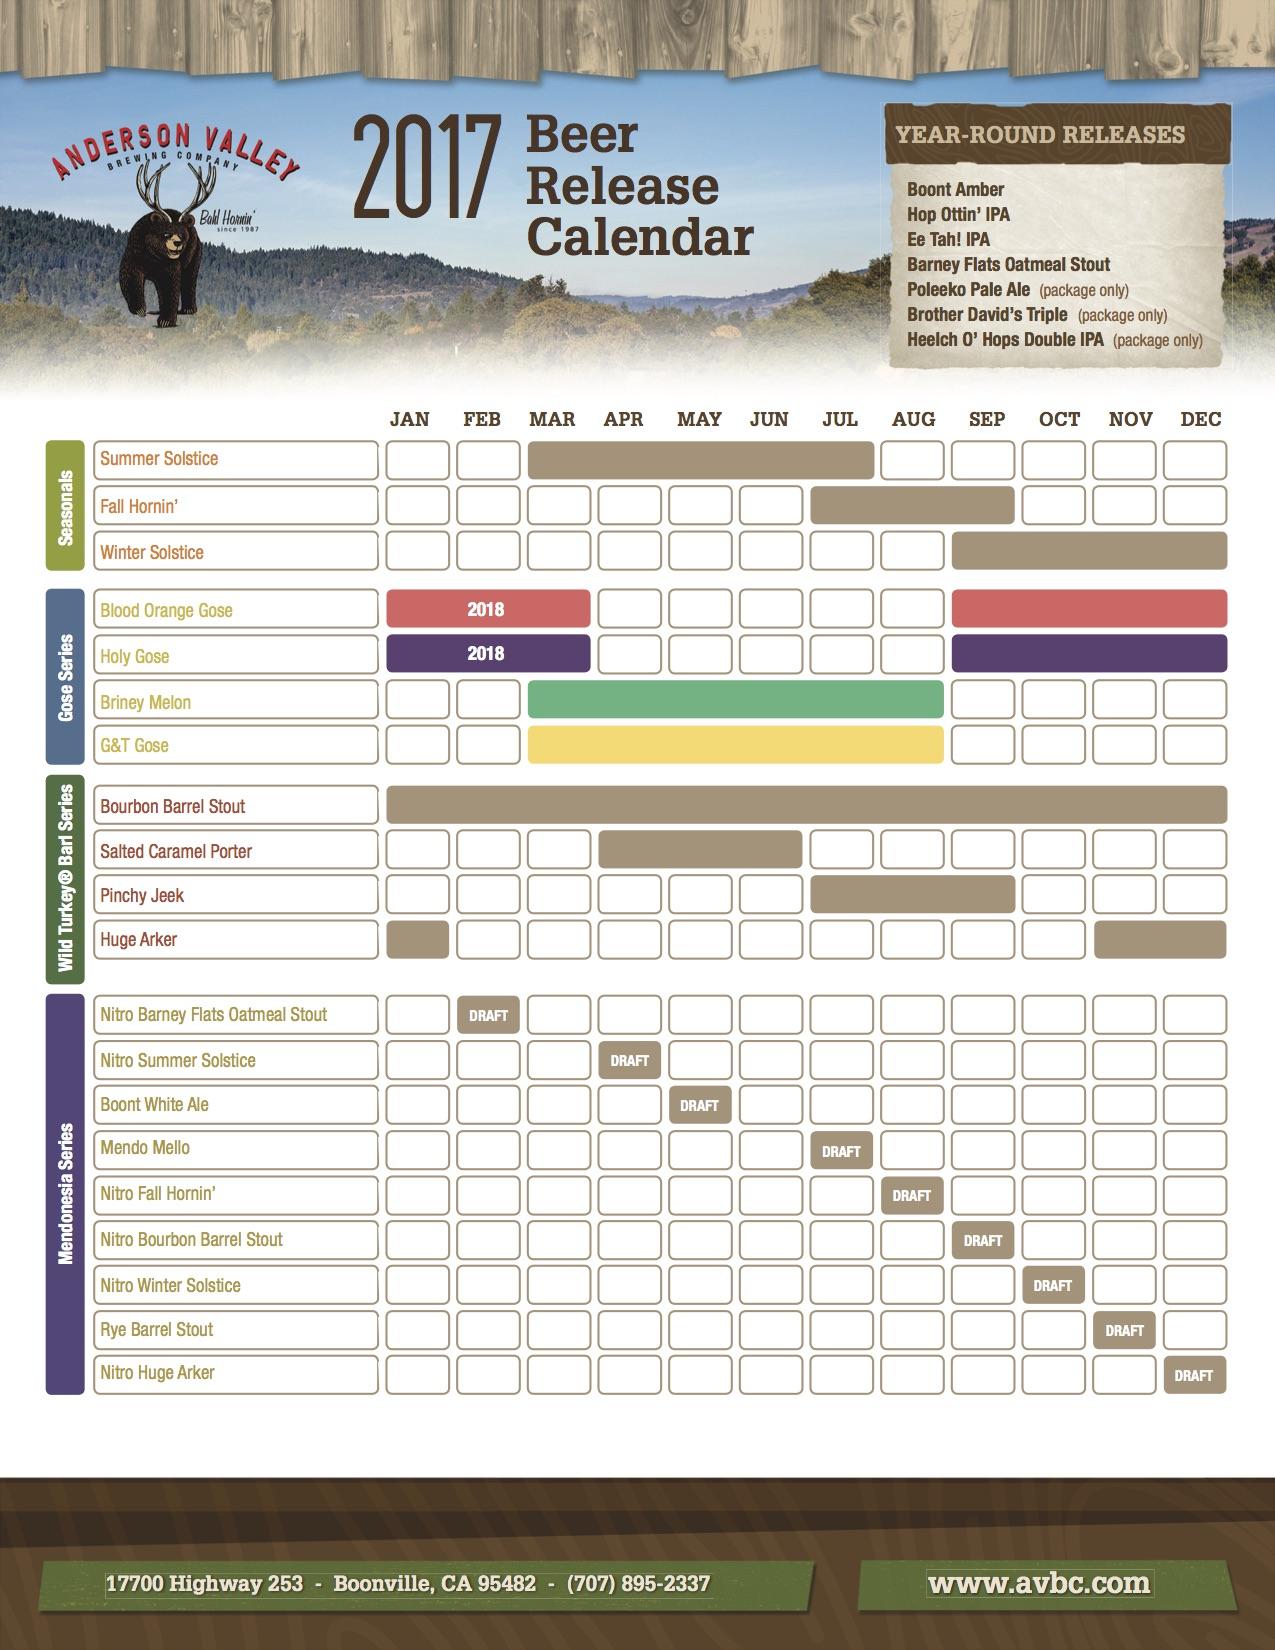 2017 Anderson Valley Beer Release Calendar